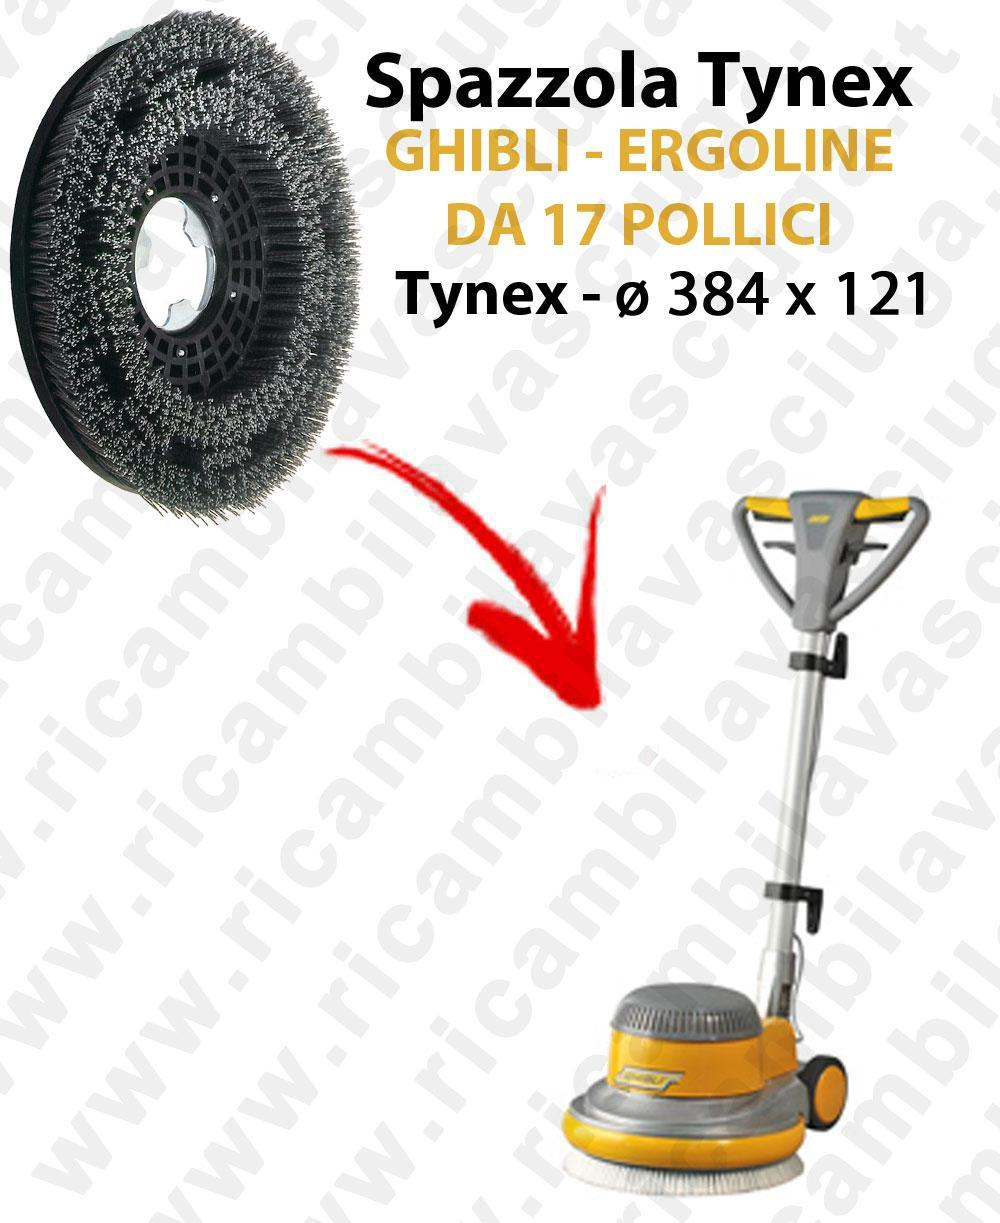 BROSSE TYNEX  pour mono BROSSE GHIBLI ERGOLINE 17 pouce. Reference: tynex  diamétre 384 X 121